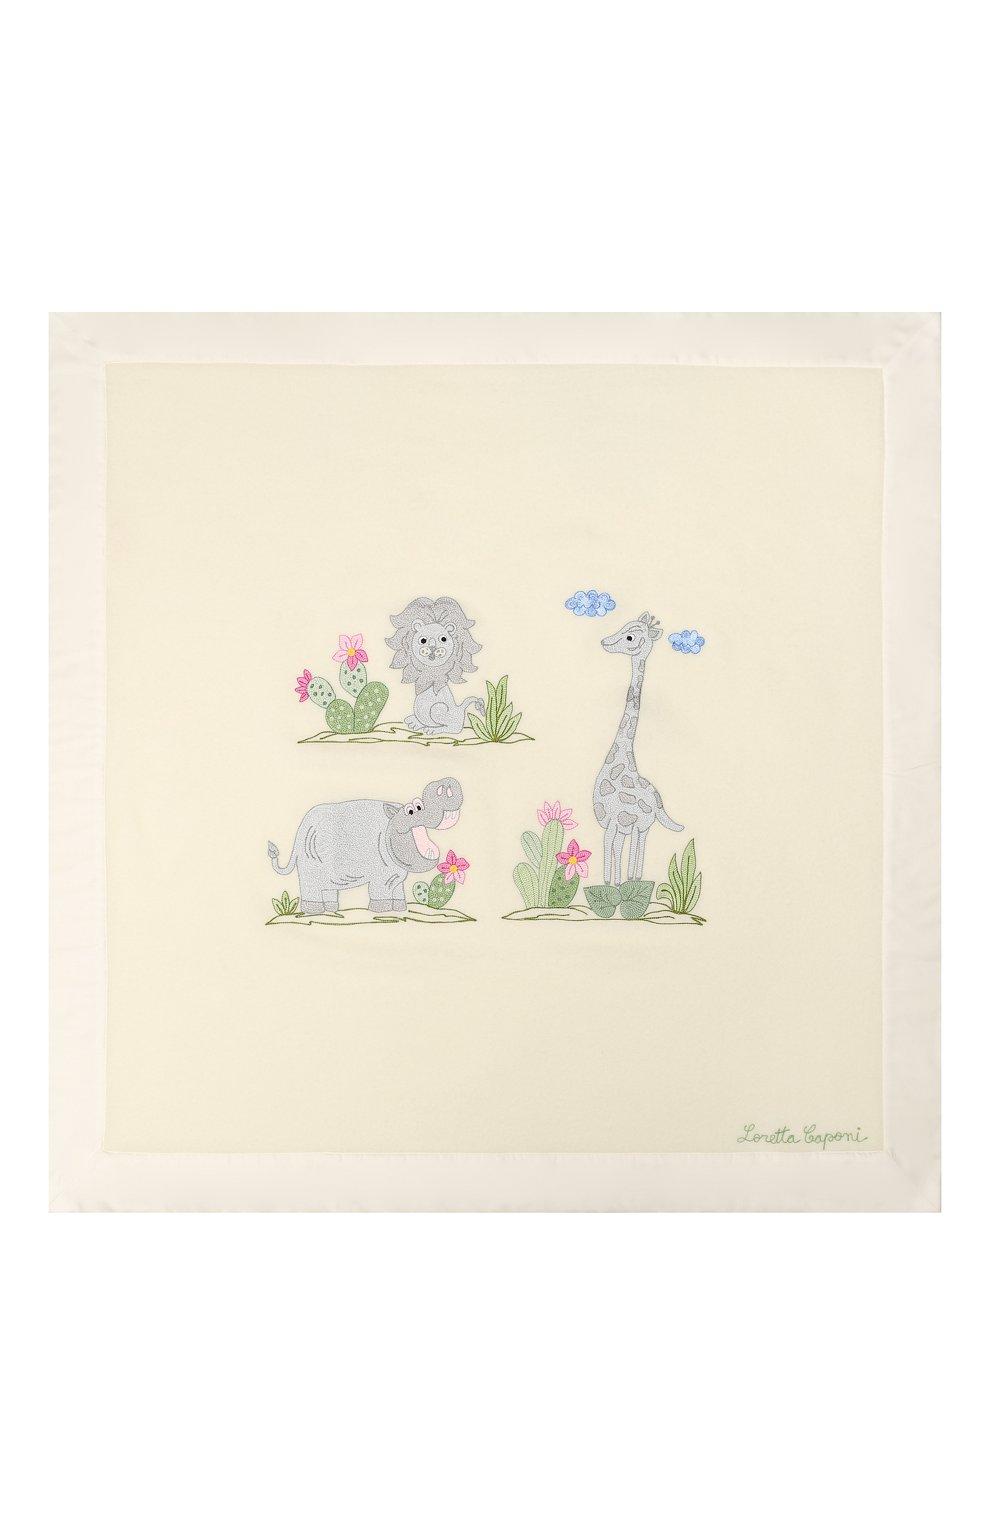 Детского шерстяное одеяло LORETTA CAPONI белого цвета, арт. 182K13308302002.GREY   Фото 2